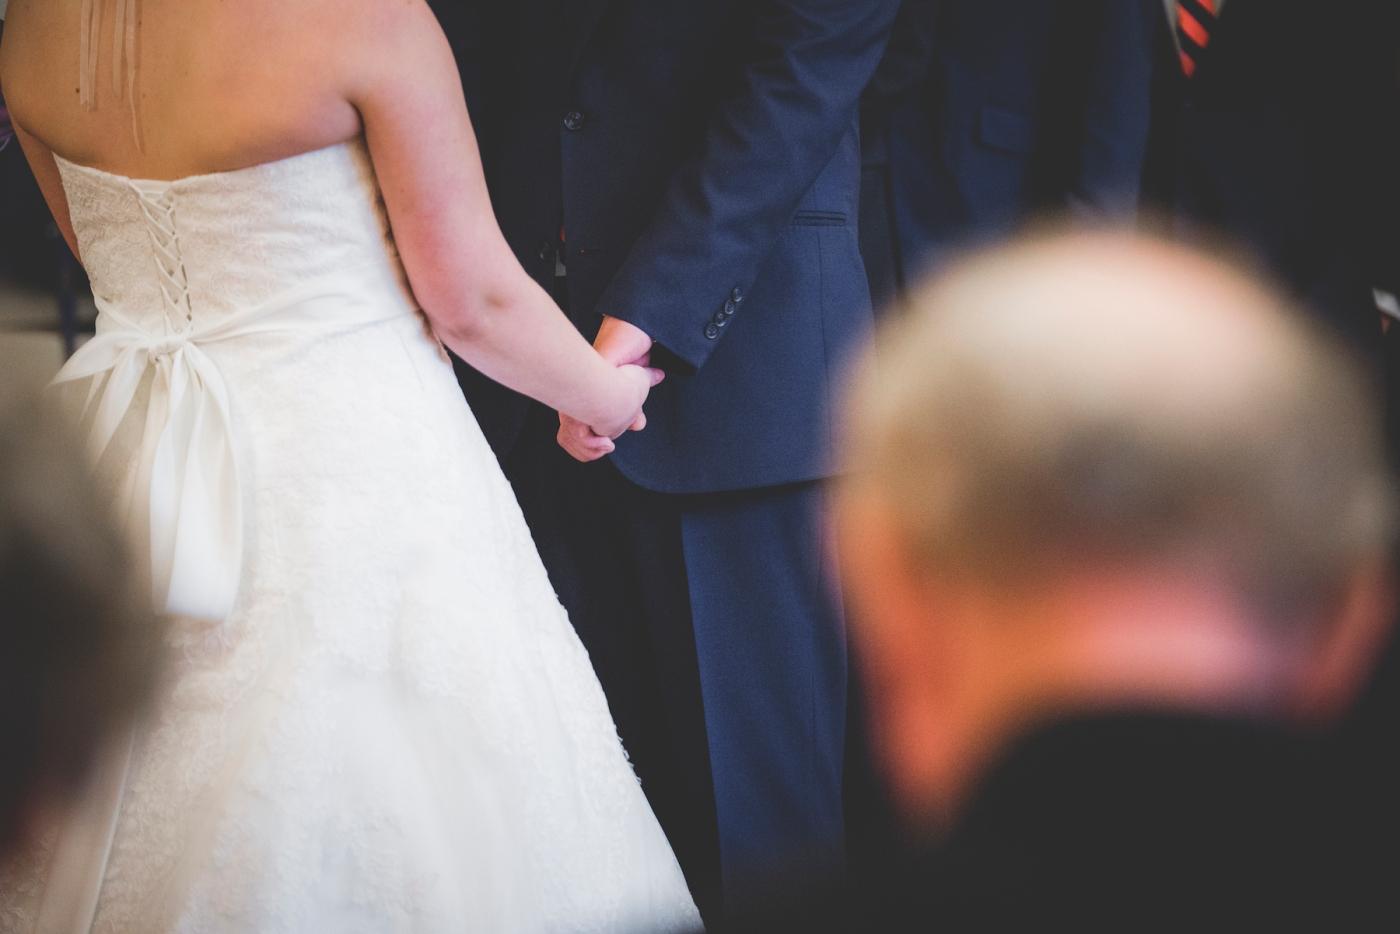 DSC_2586Everett_Wedding_Ballroom_Jane_Speleers_photography_Rachel_and_Edmund_Ceremony_2017